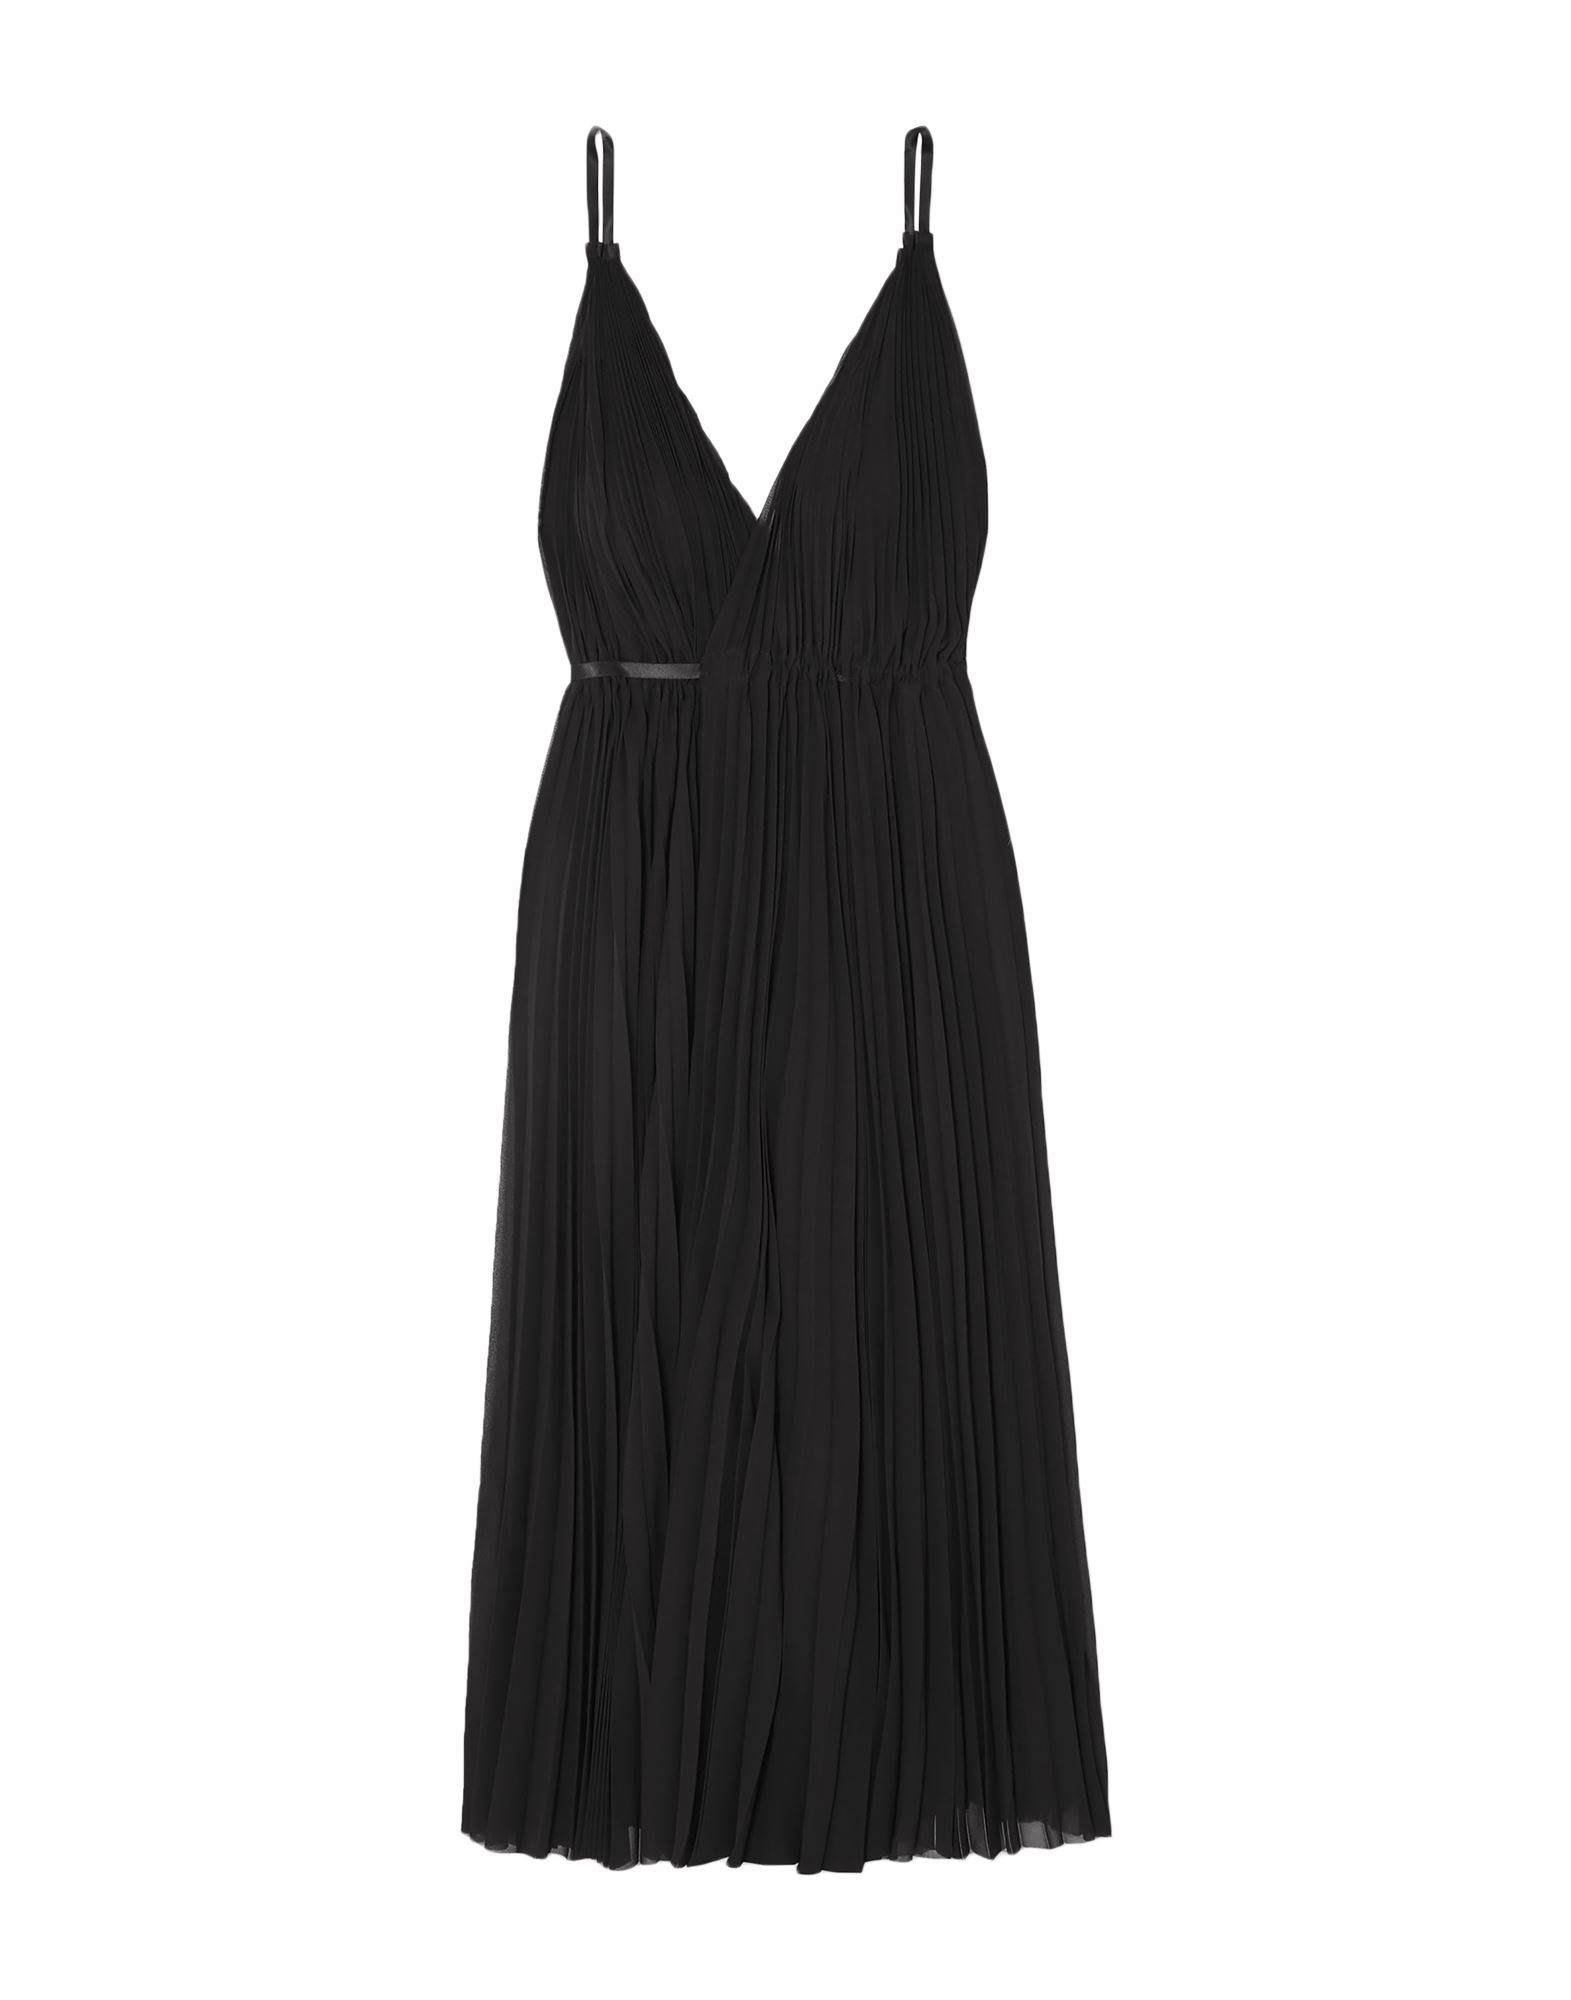 TRE by NATALIE RATABESI Длинное платье